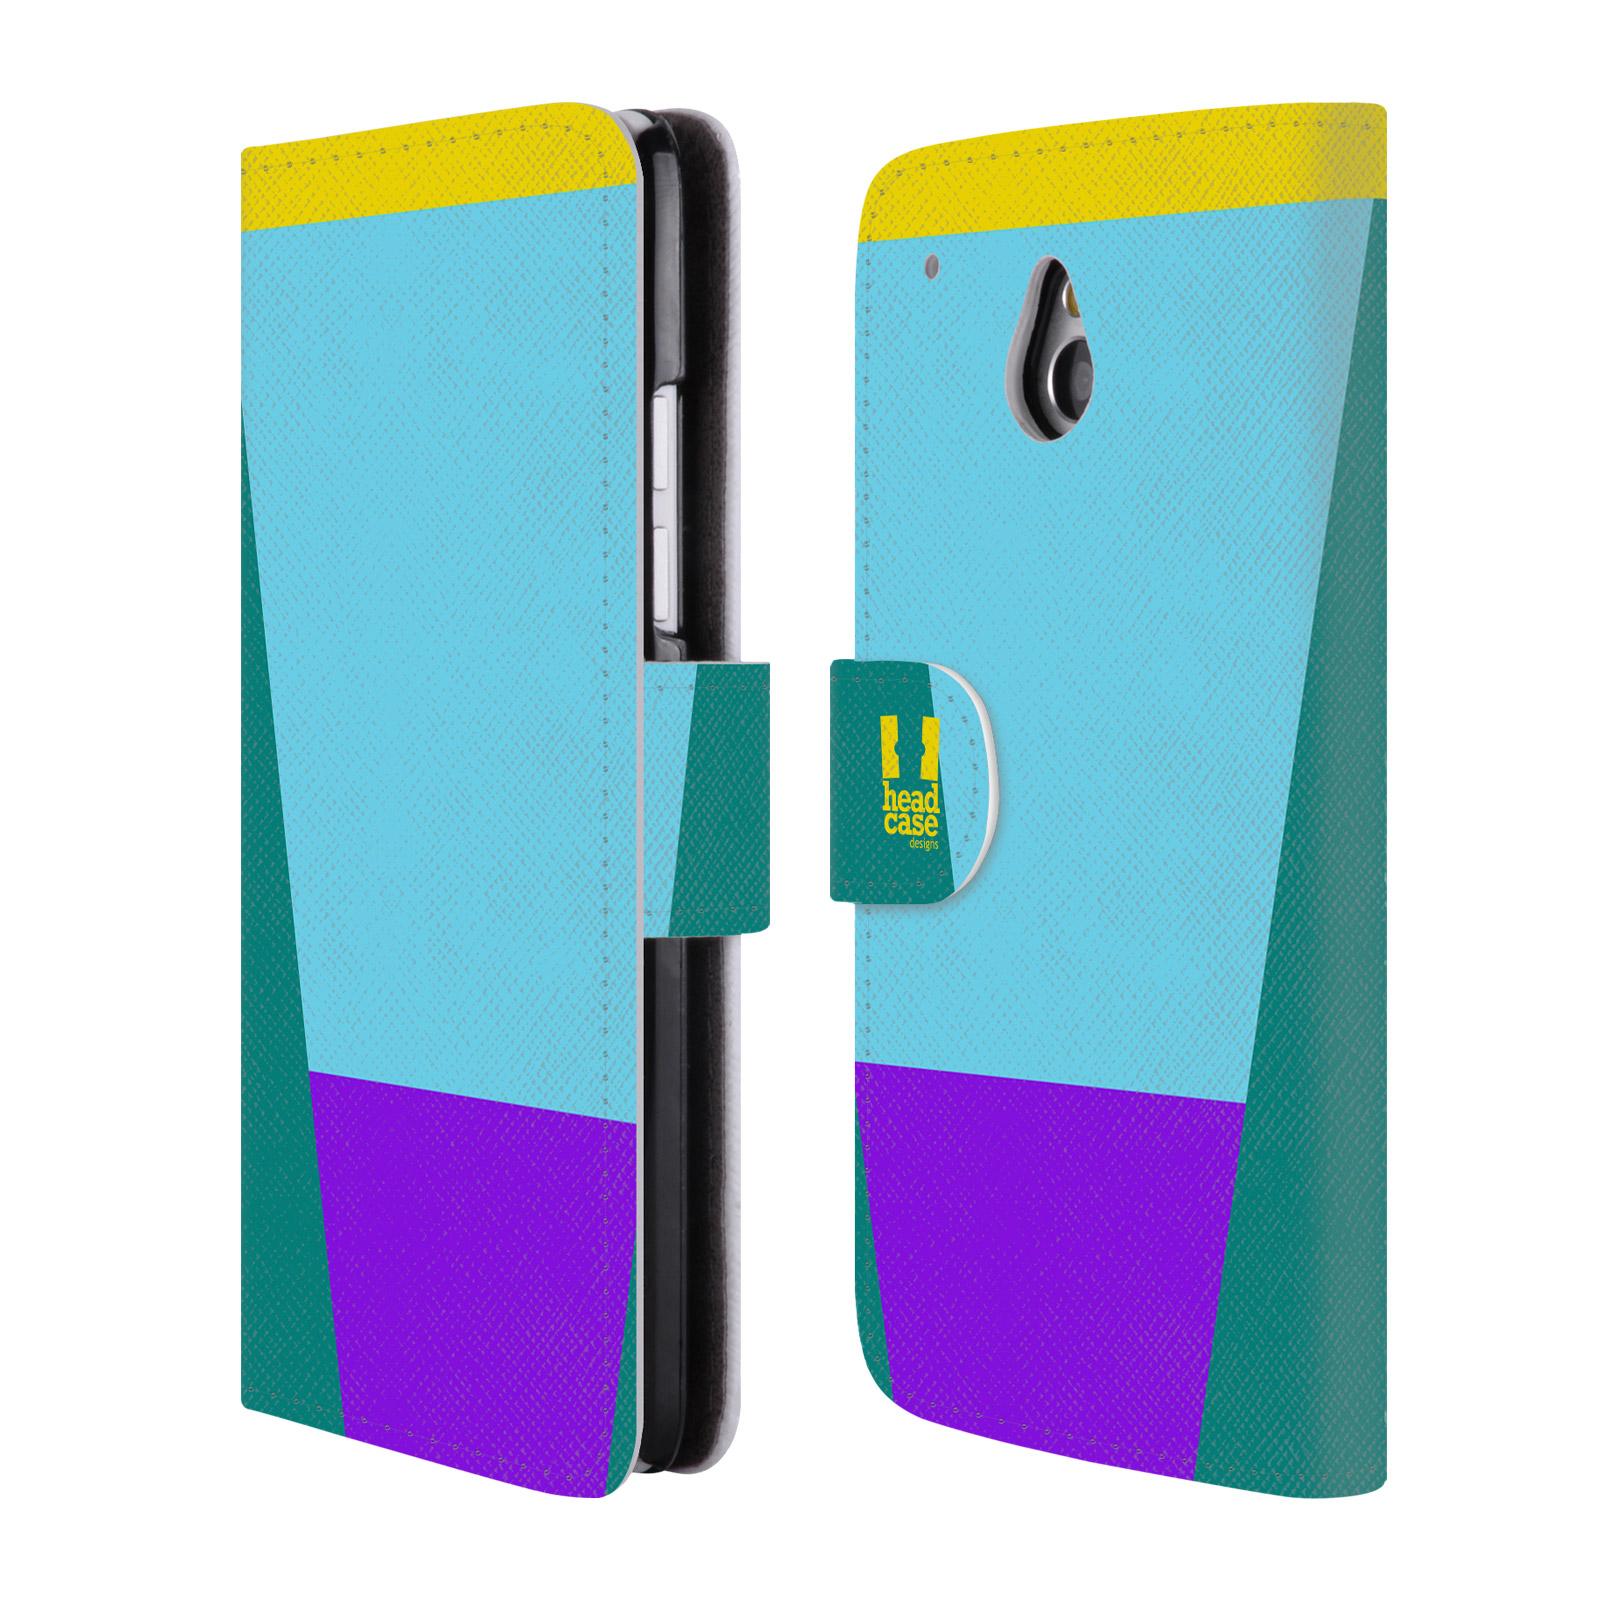 HEAD CASE Flipové pouzdro pro mobil HTC ONE MINI barevné tvary nebesky modrá